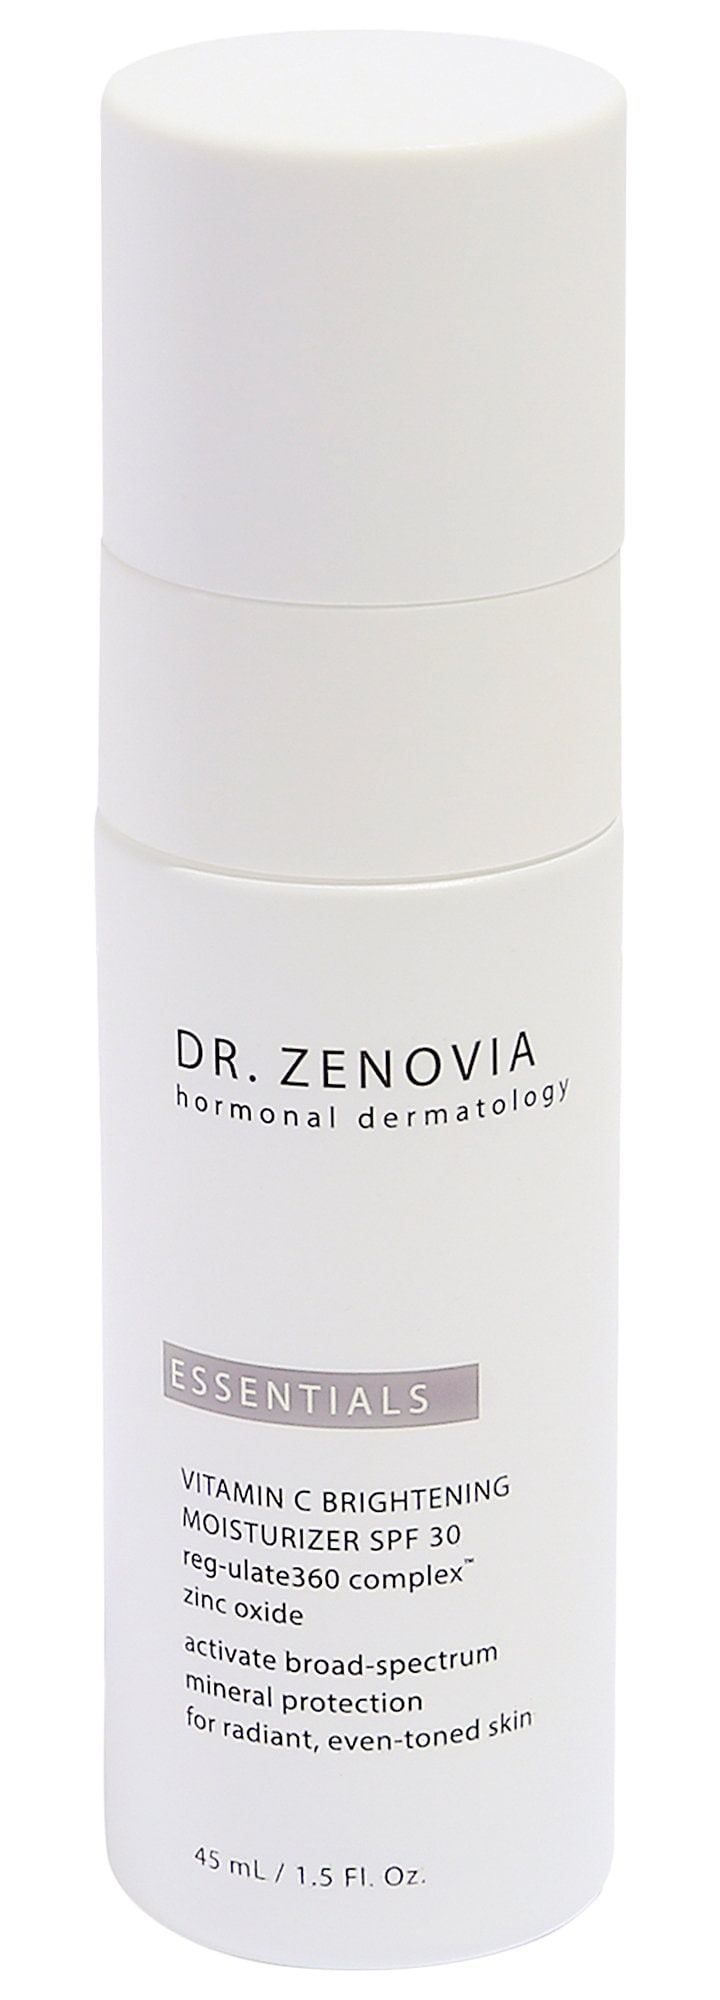 dr zenovia Vitamin C Brightening Moisturizer Spf 30